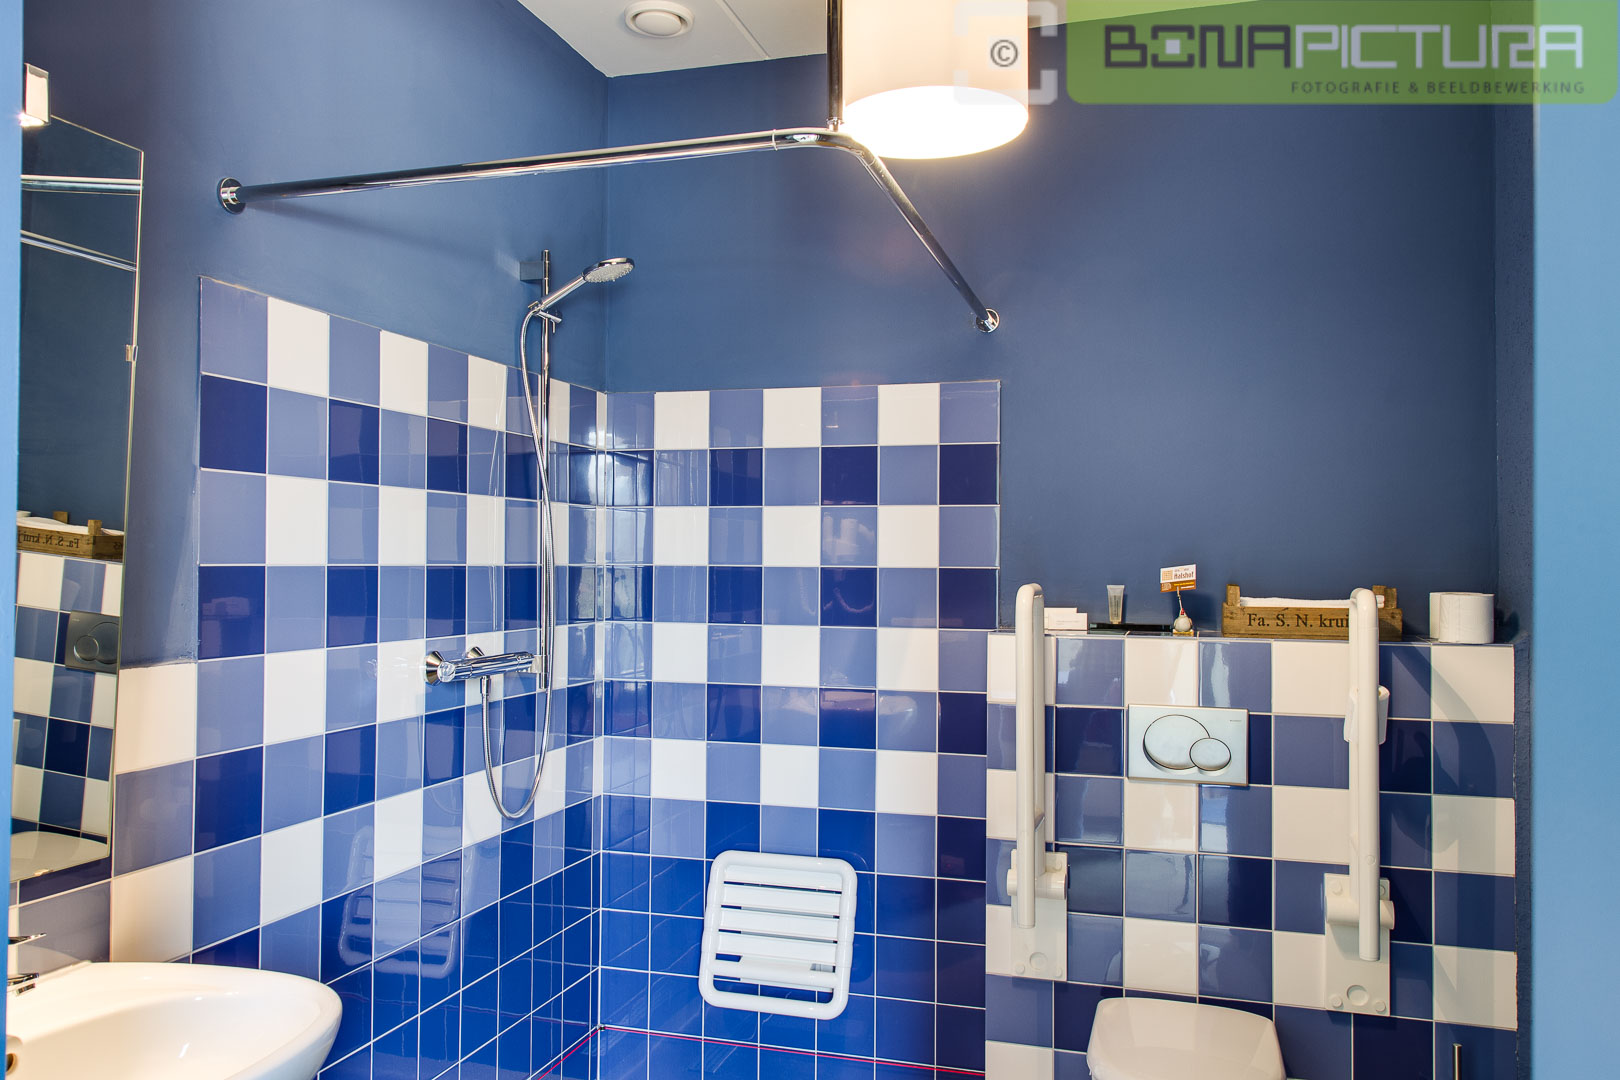 Invaliden badkamer - Bona Pictura